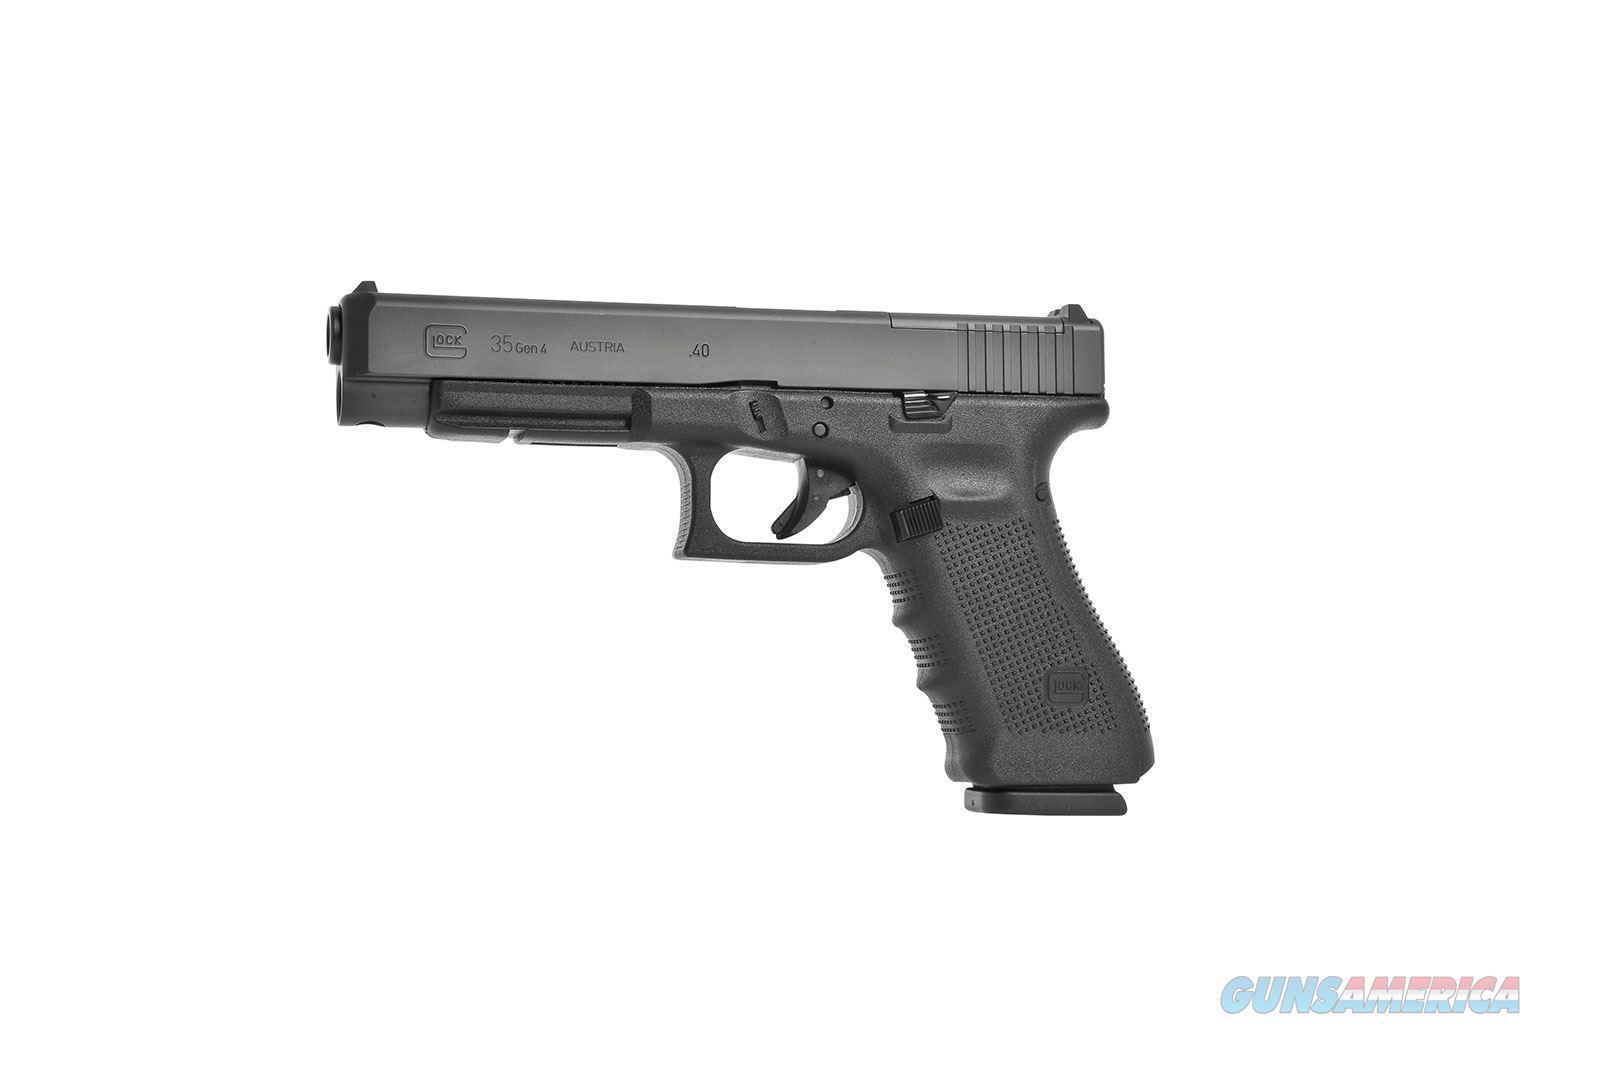 Glock 35 Gen 4 M.O.S., 40 S&W, NIB   Guns > Pistols > Glock Pistols > 35